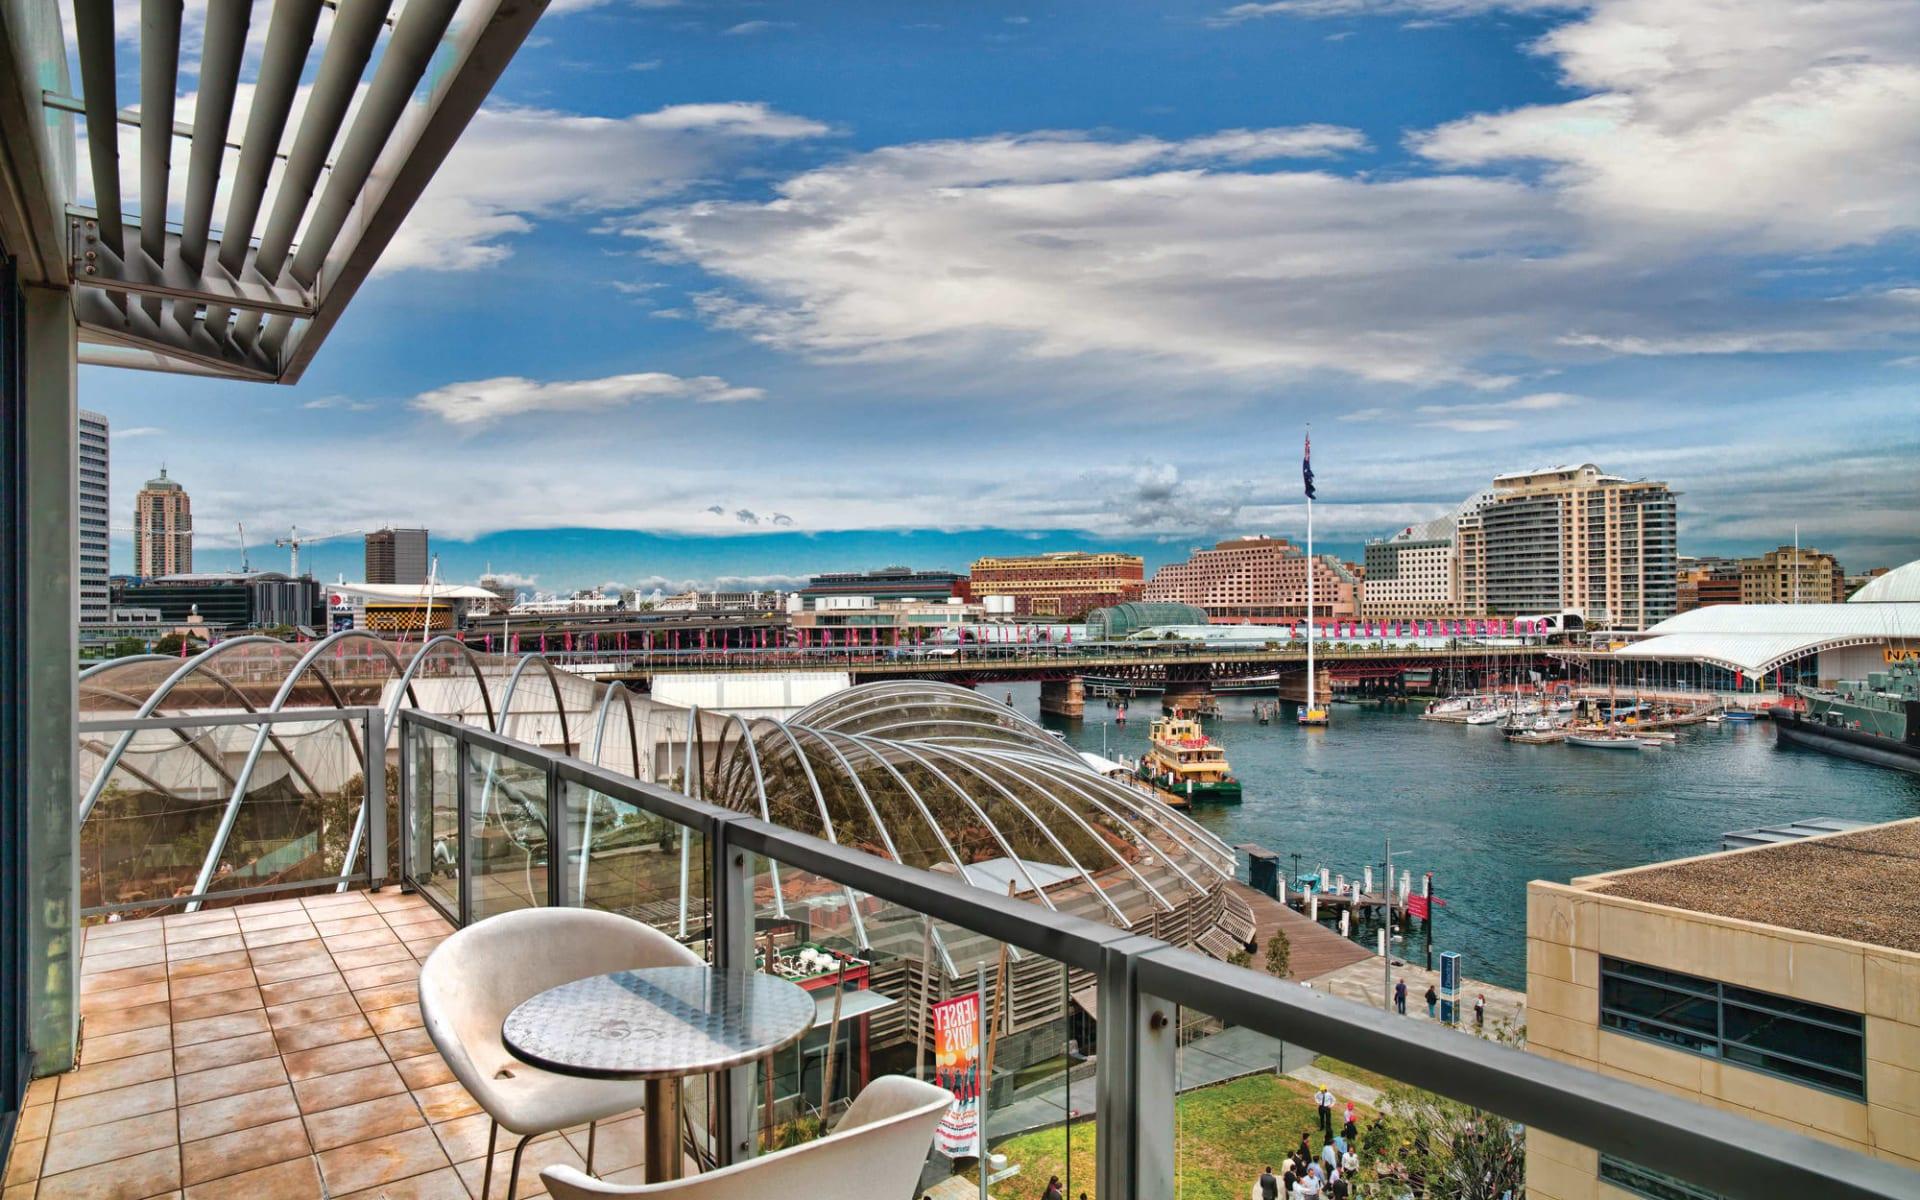 Adina Apartment Hotel Sydney Darling Harbour: Adina Apartment Hotel Sydney Harbourside - Sicht aus dem Zimmer